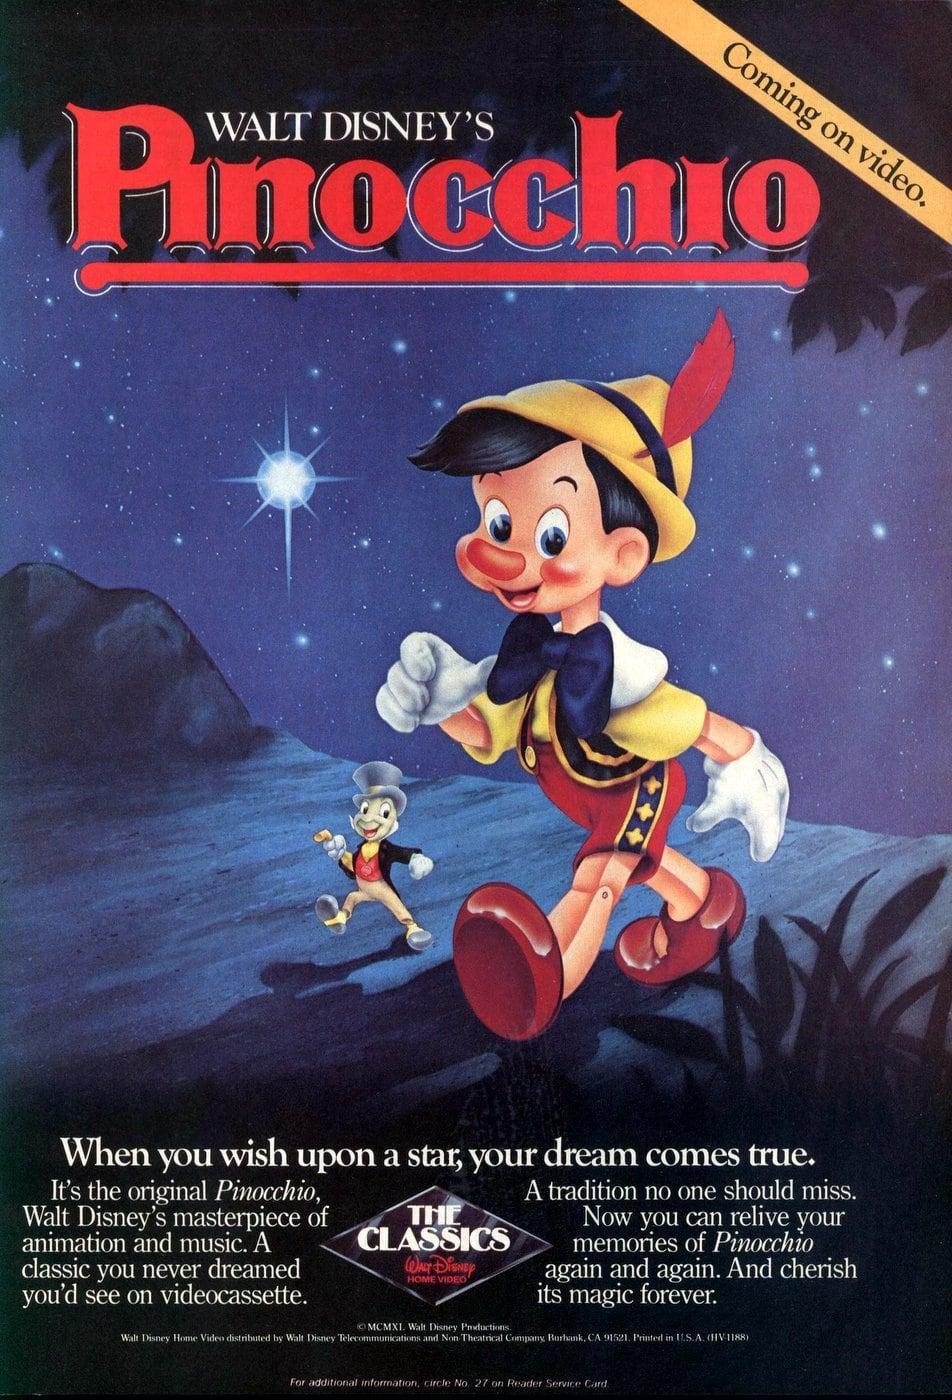 Disney's Pinocchio on video tape (1985)